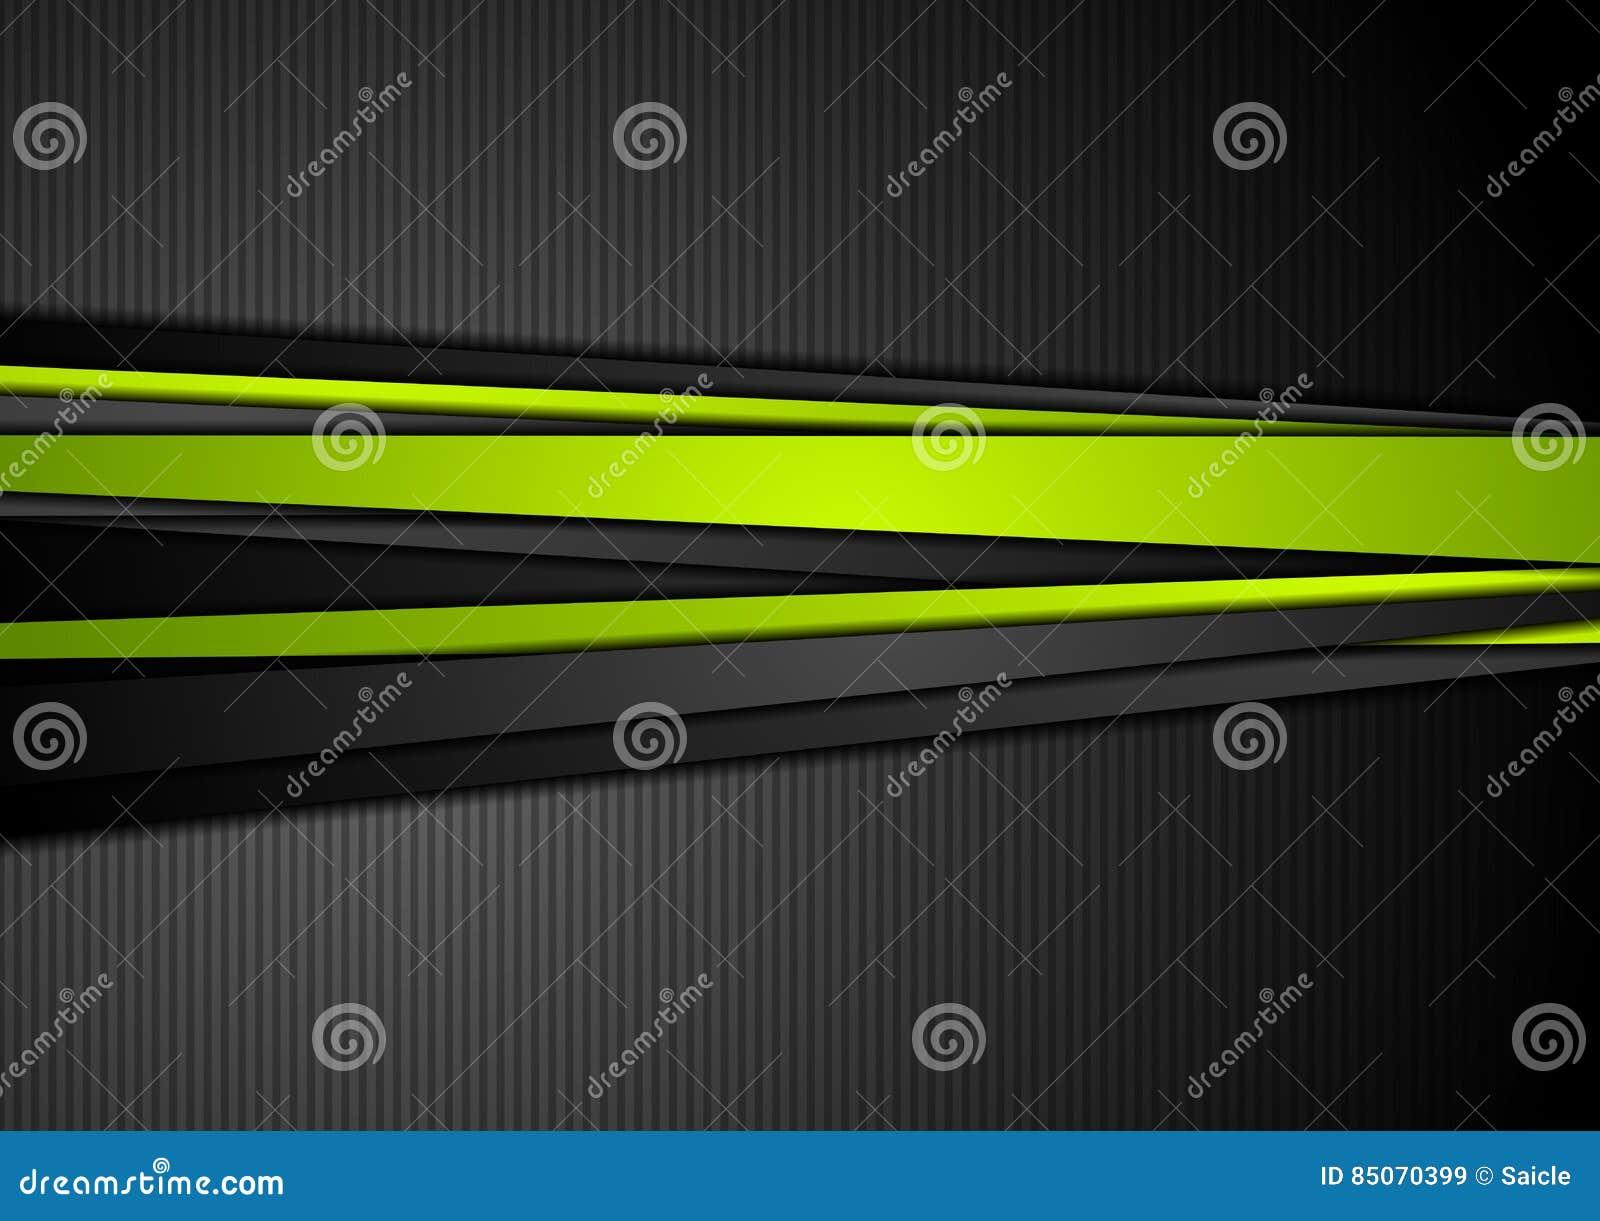 Контраст для зеленого цвета